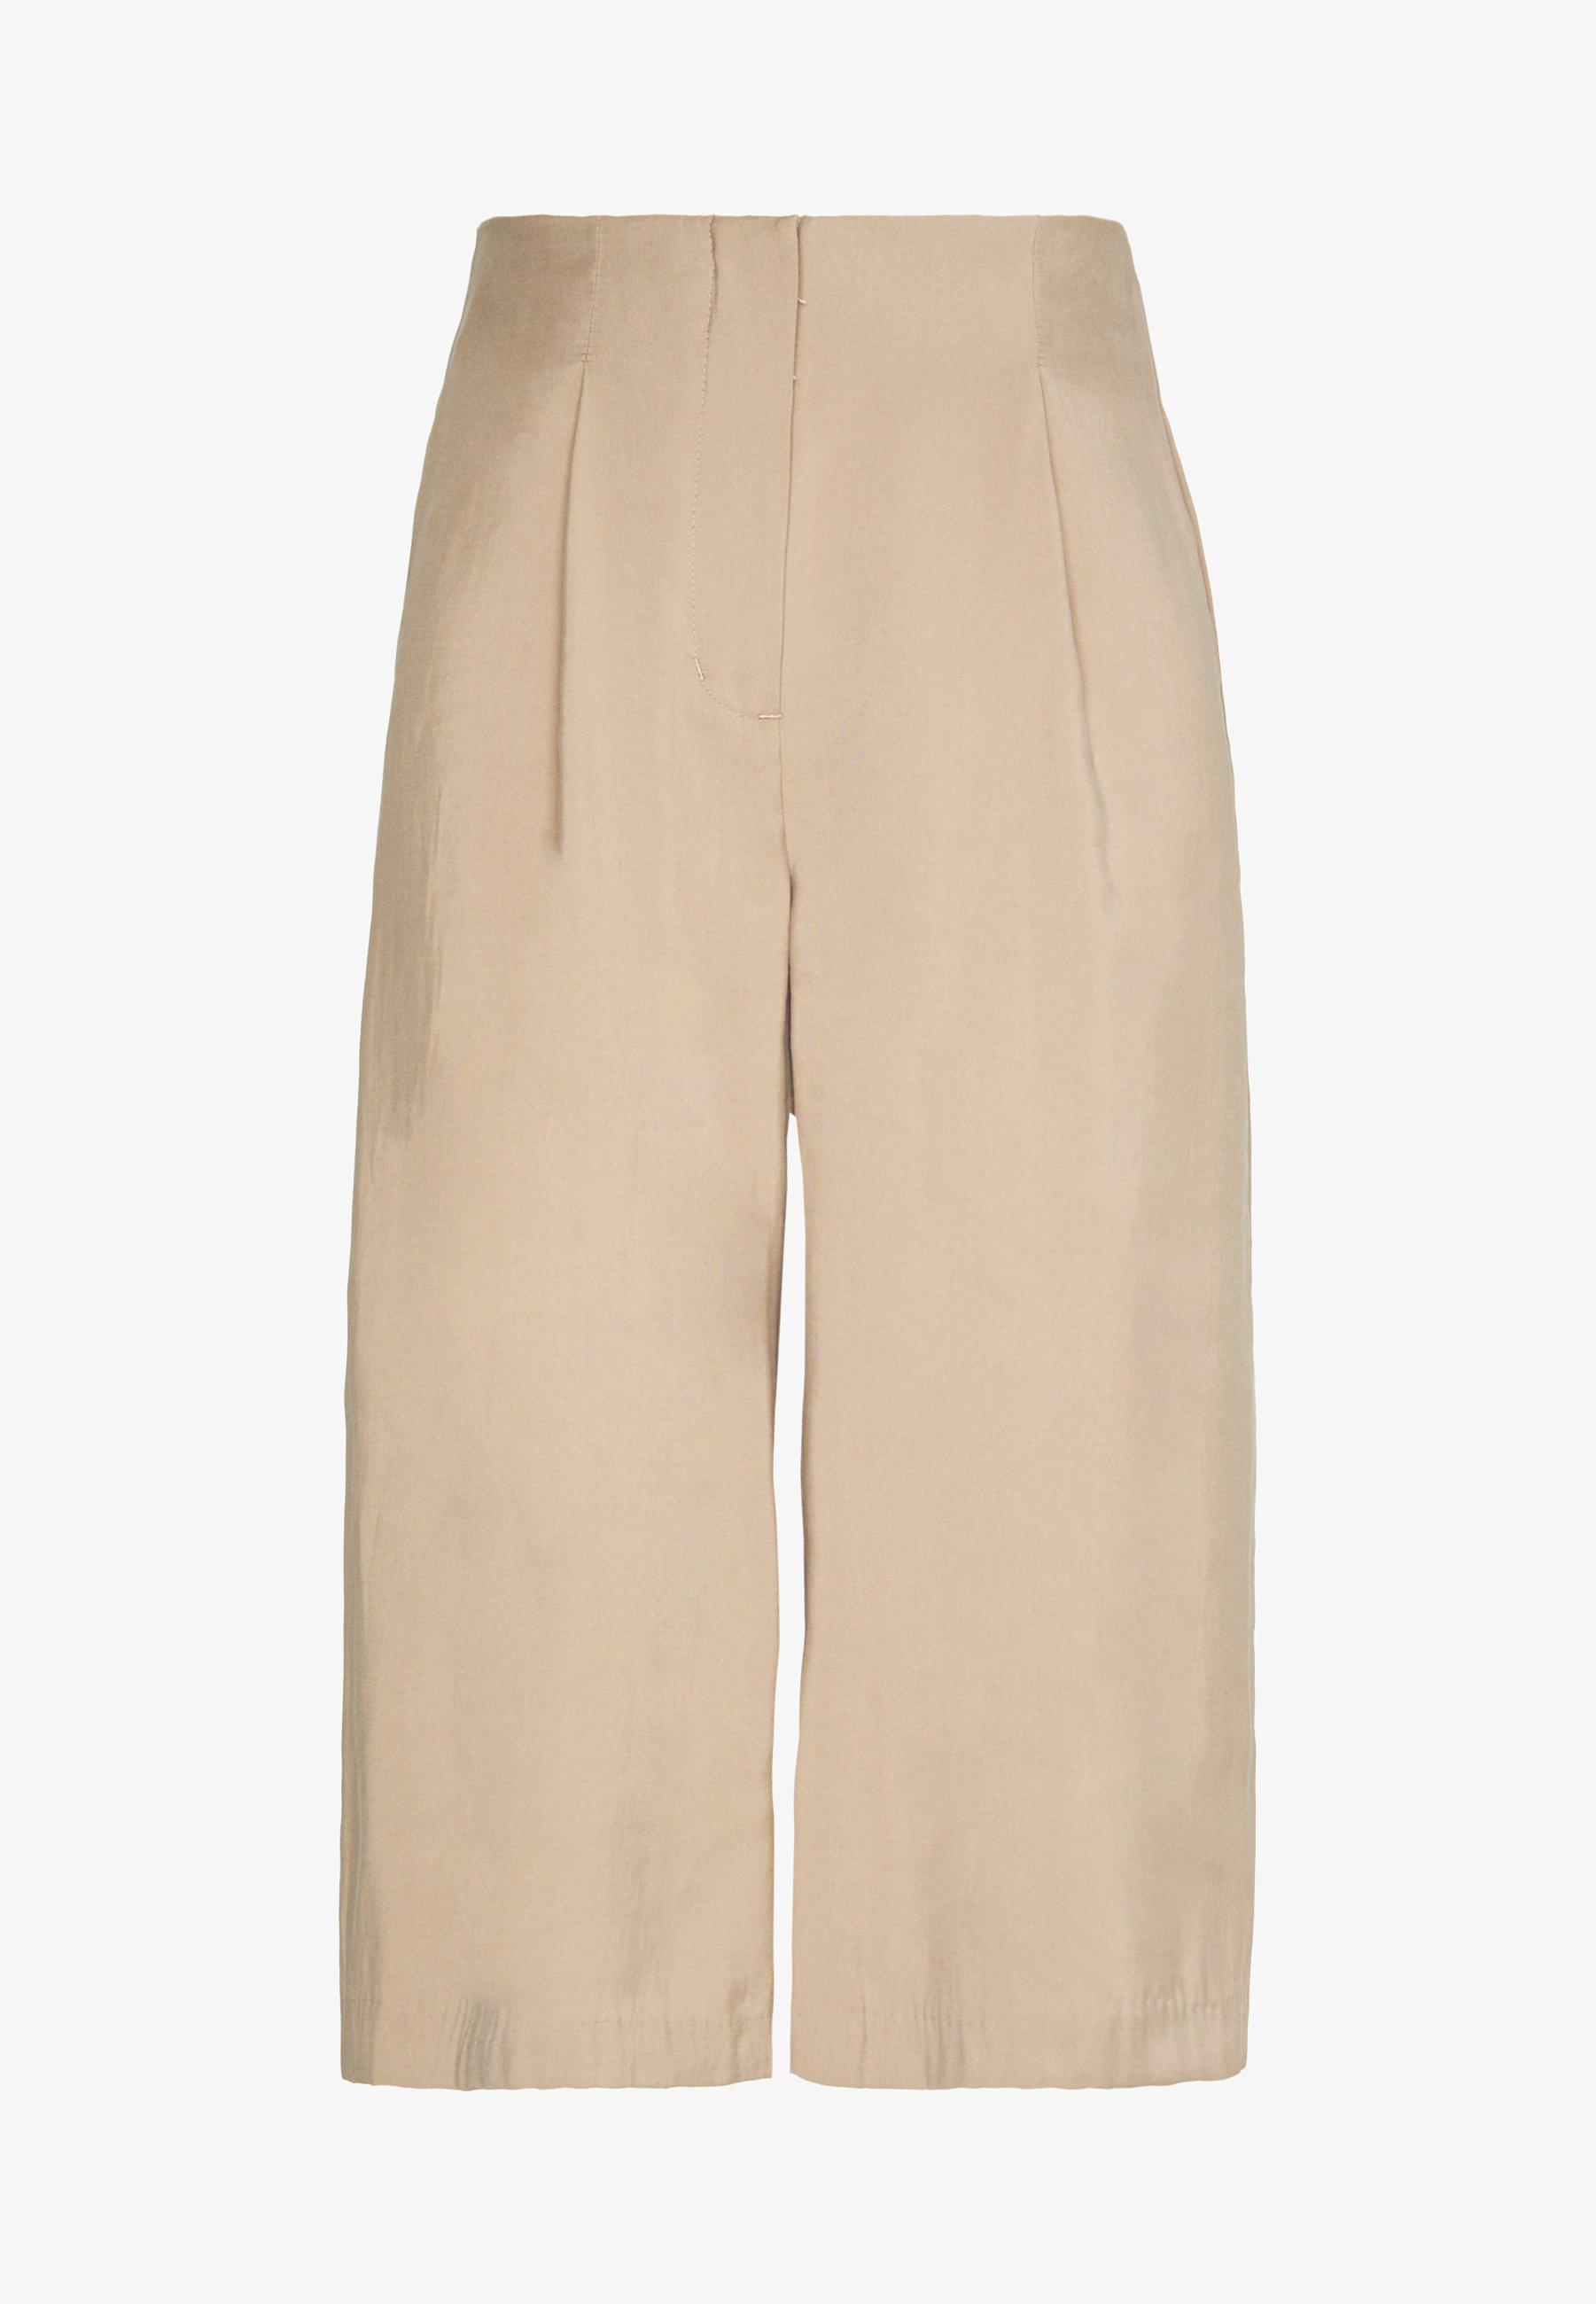 Culotte de Vero Moda.